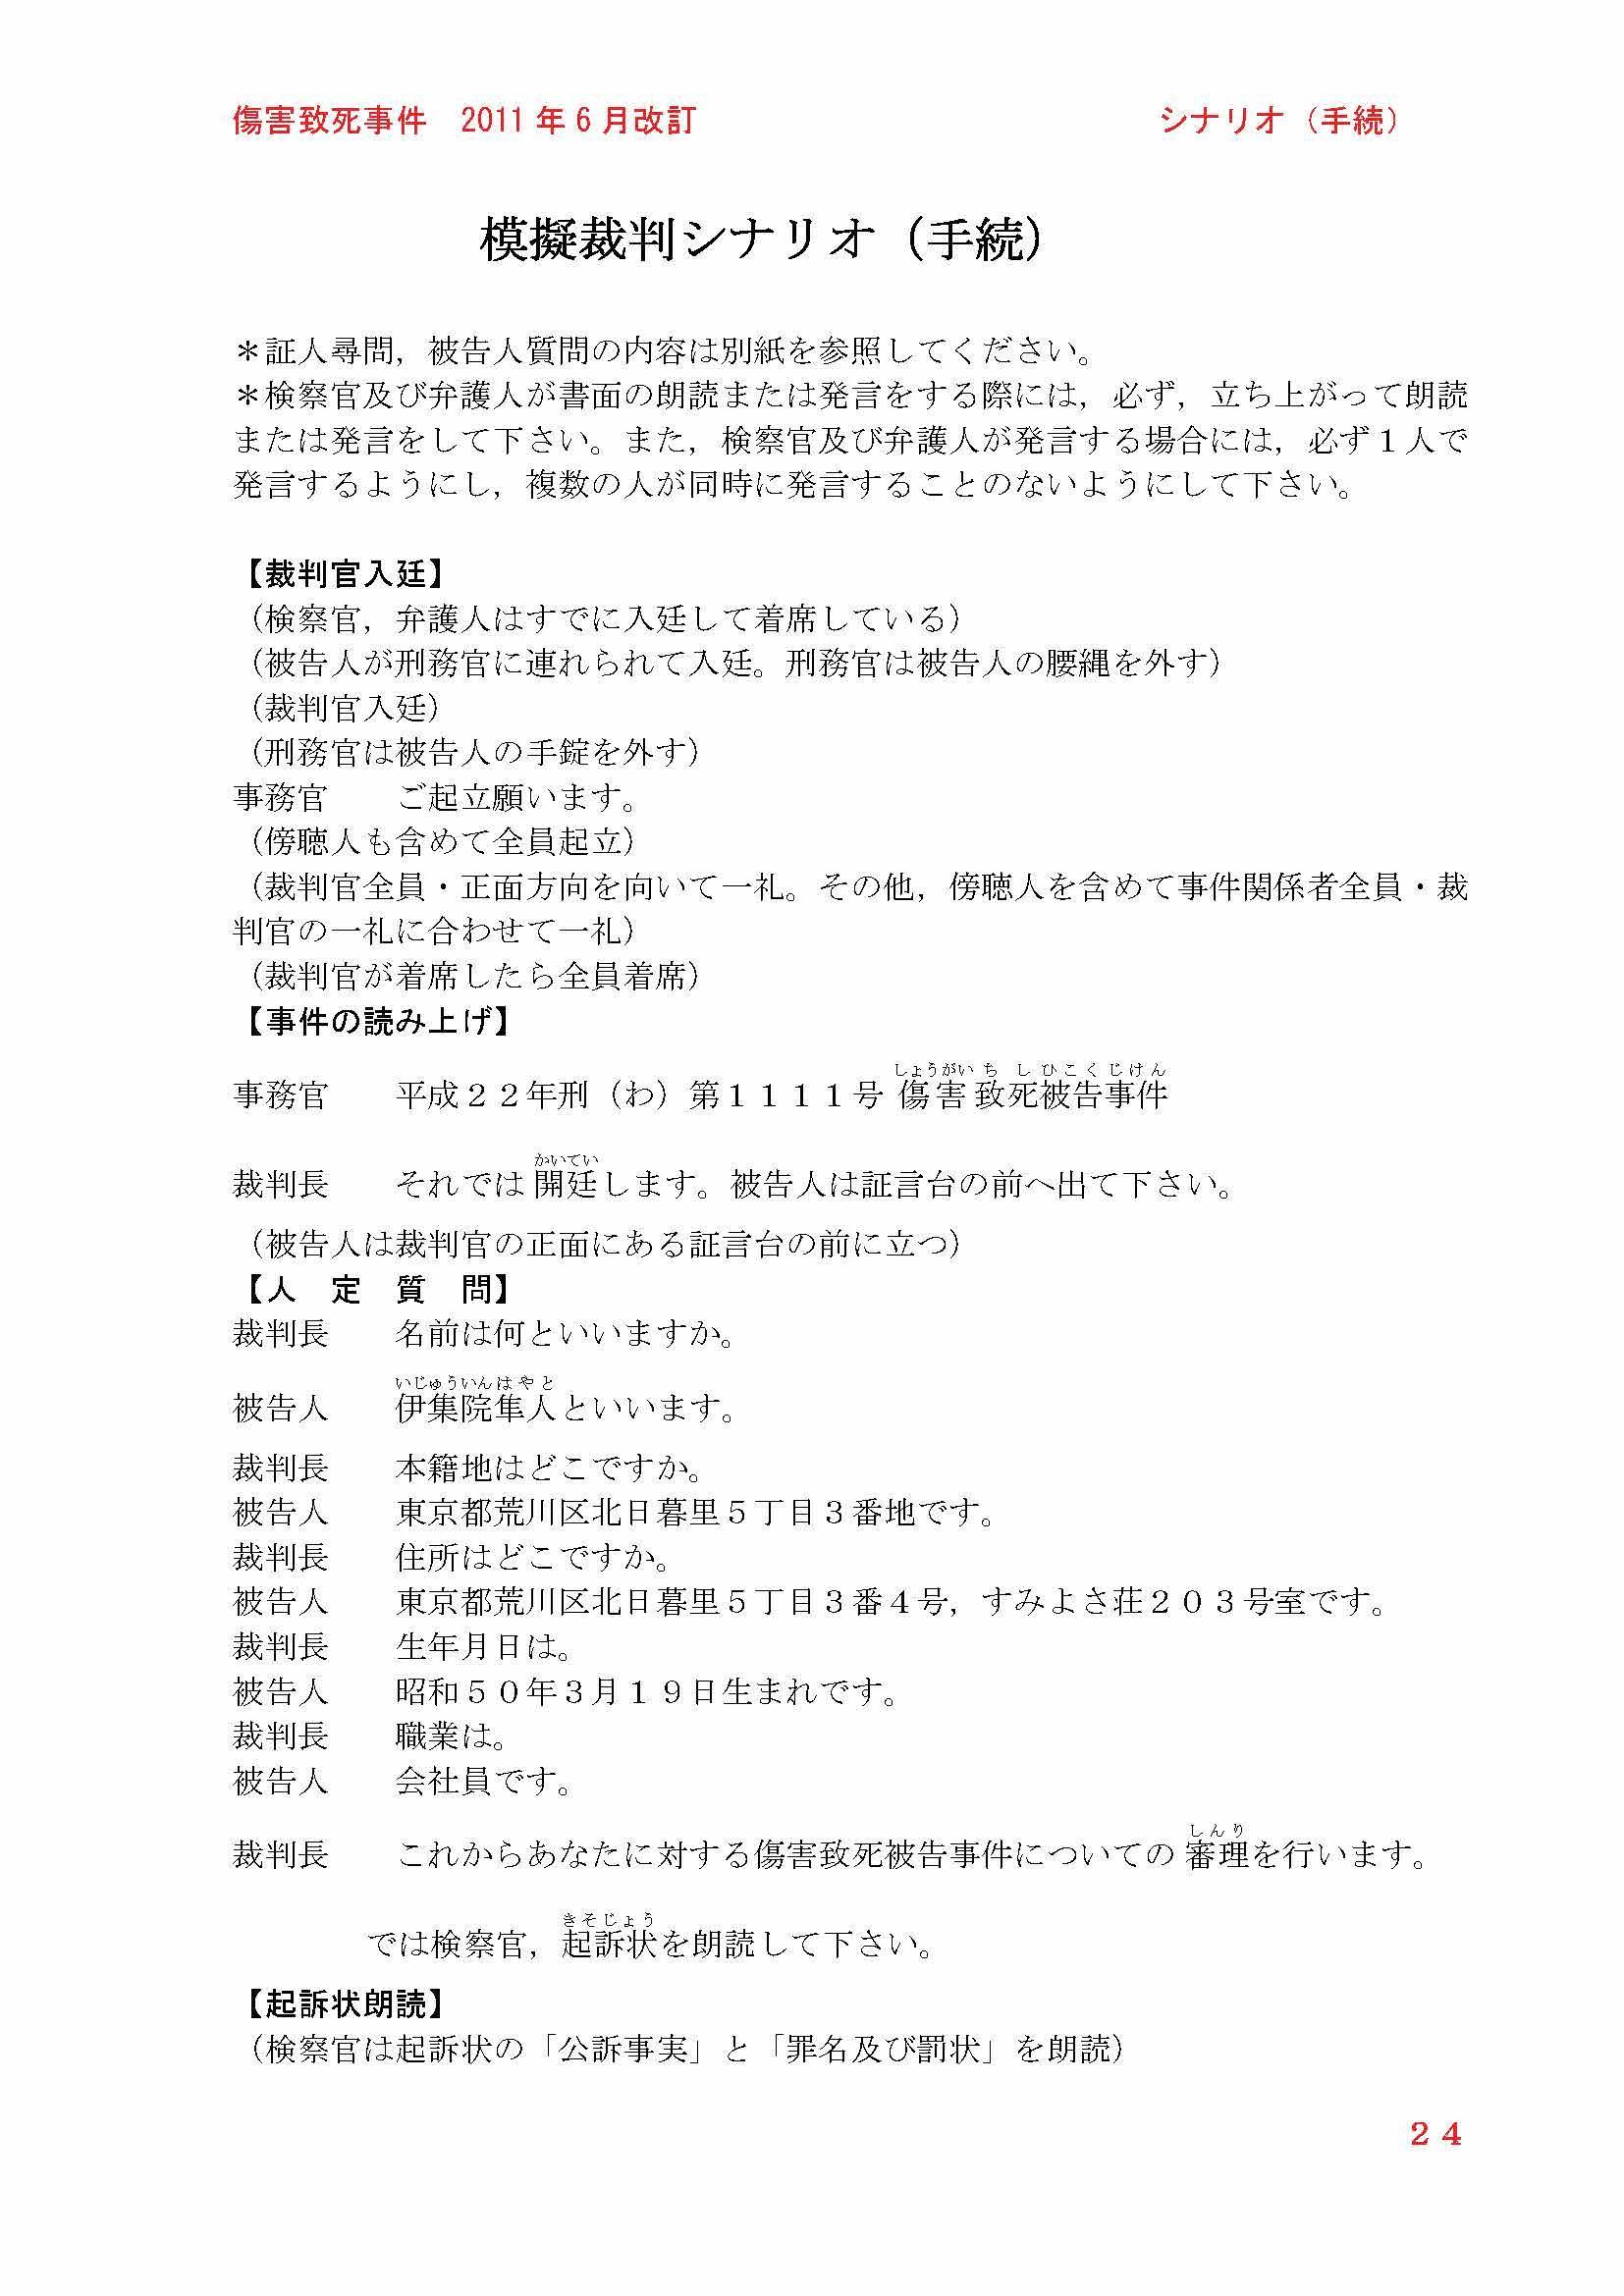 shogaichishi2-3.jpg